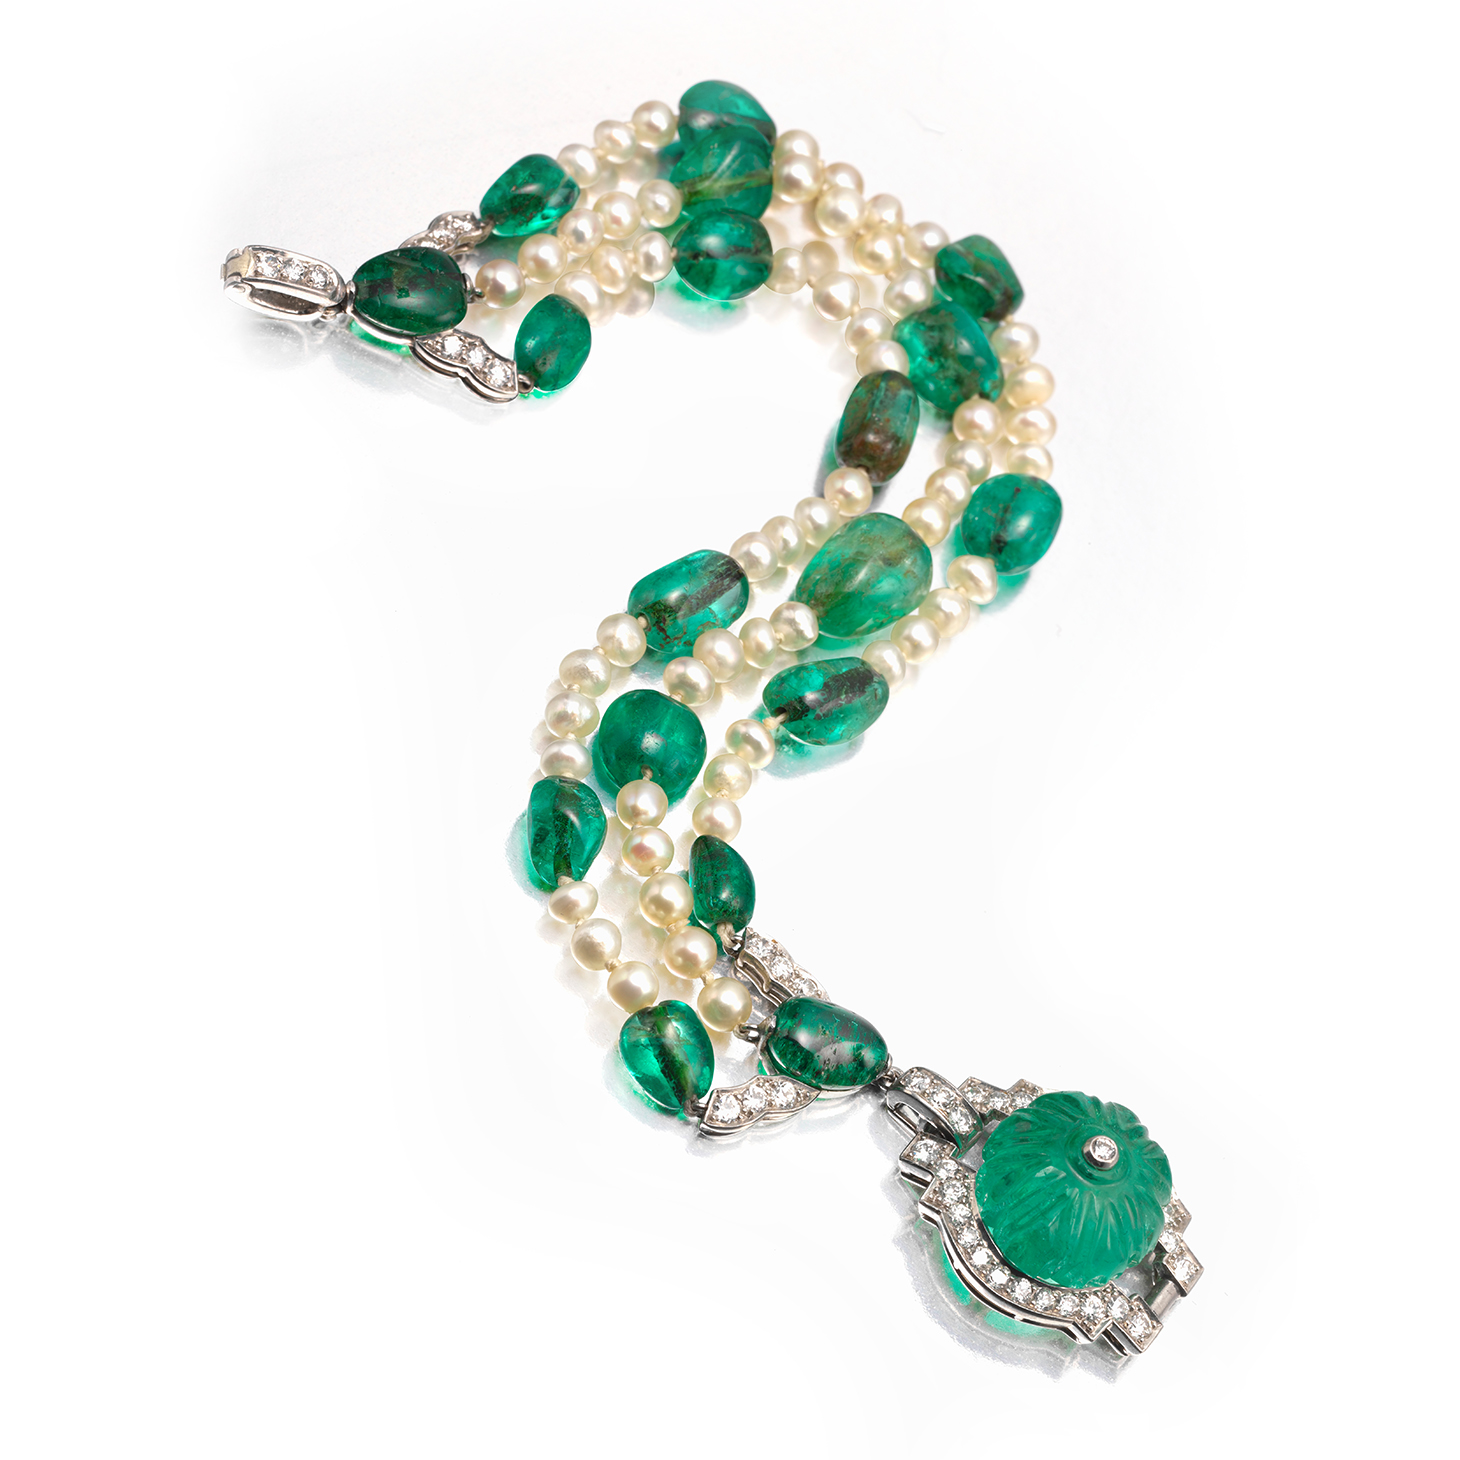 Cartier Art Deco Emerald Bead and Pearl Bracelet, circa 1925